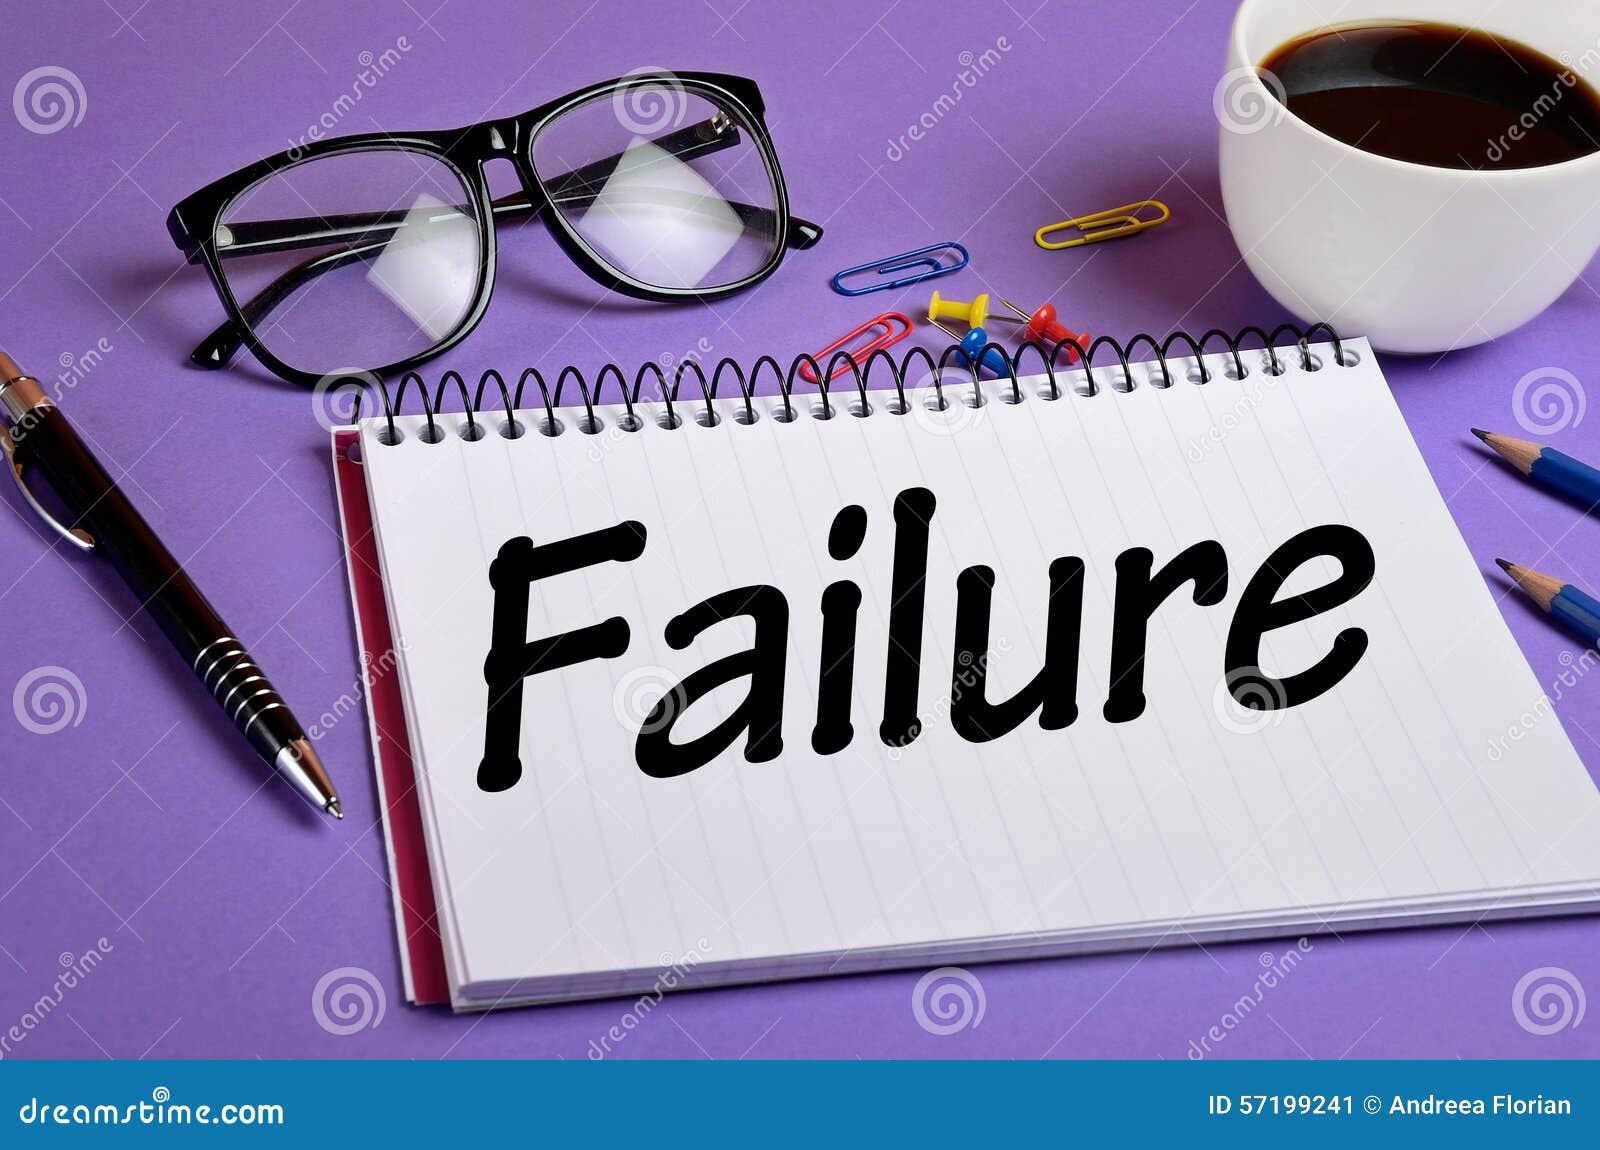 Failure Word Stock Photo - Image: 57199241